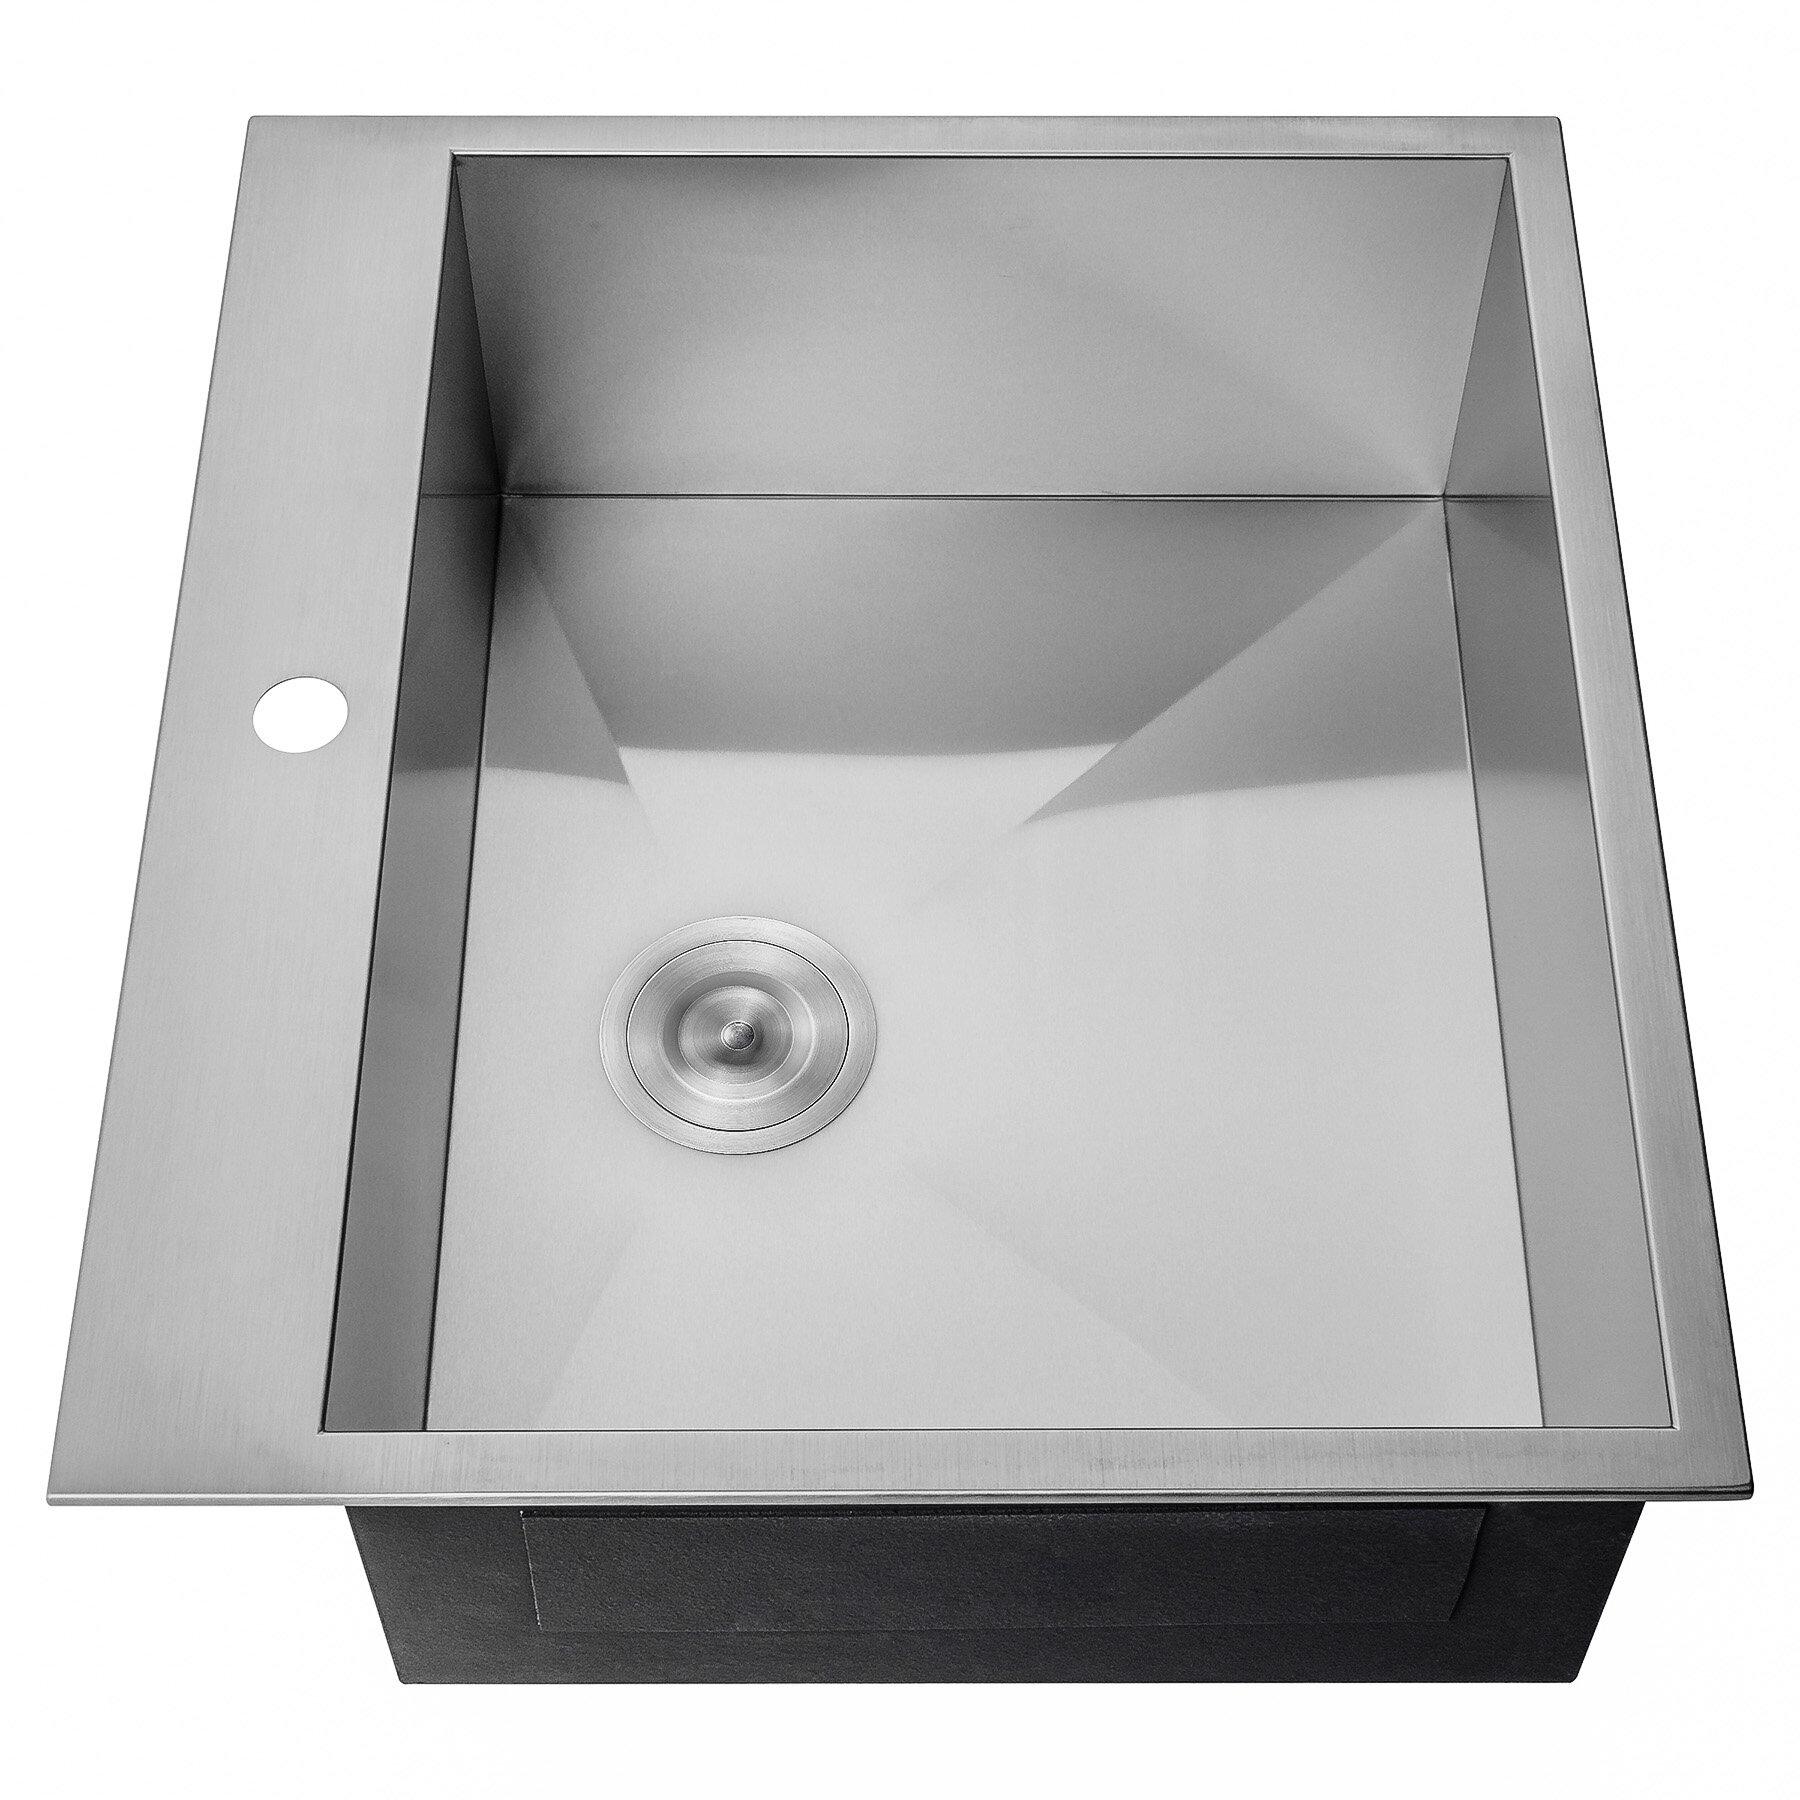 Akdy 25 x 22 drop in kitchen sink reviews wayfair